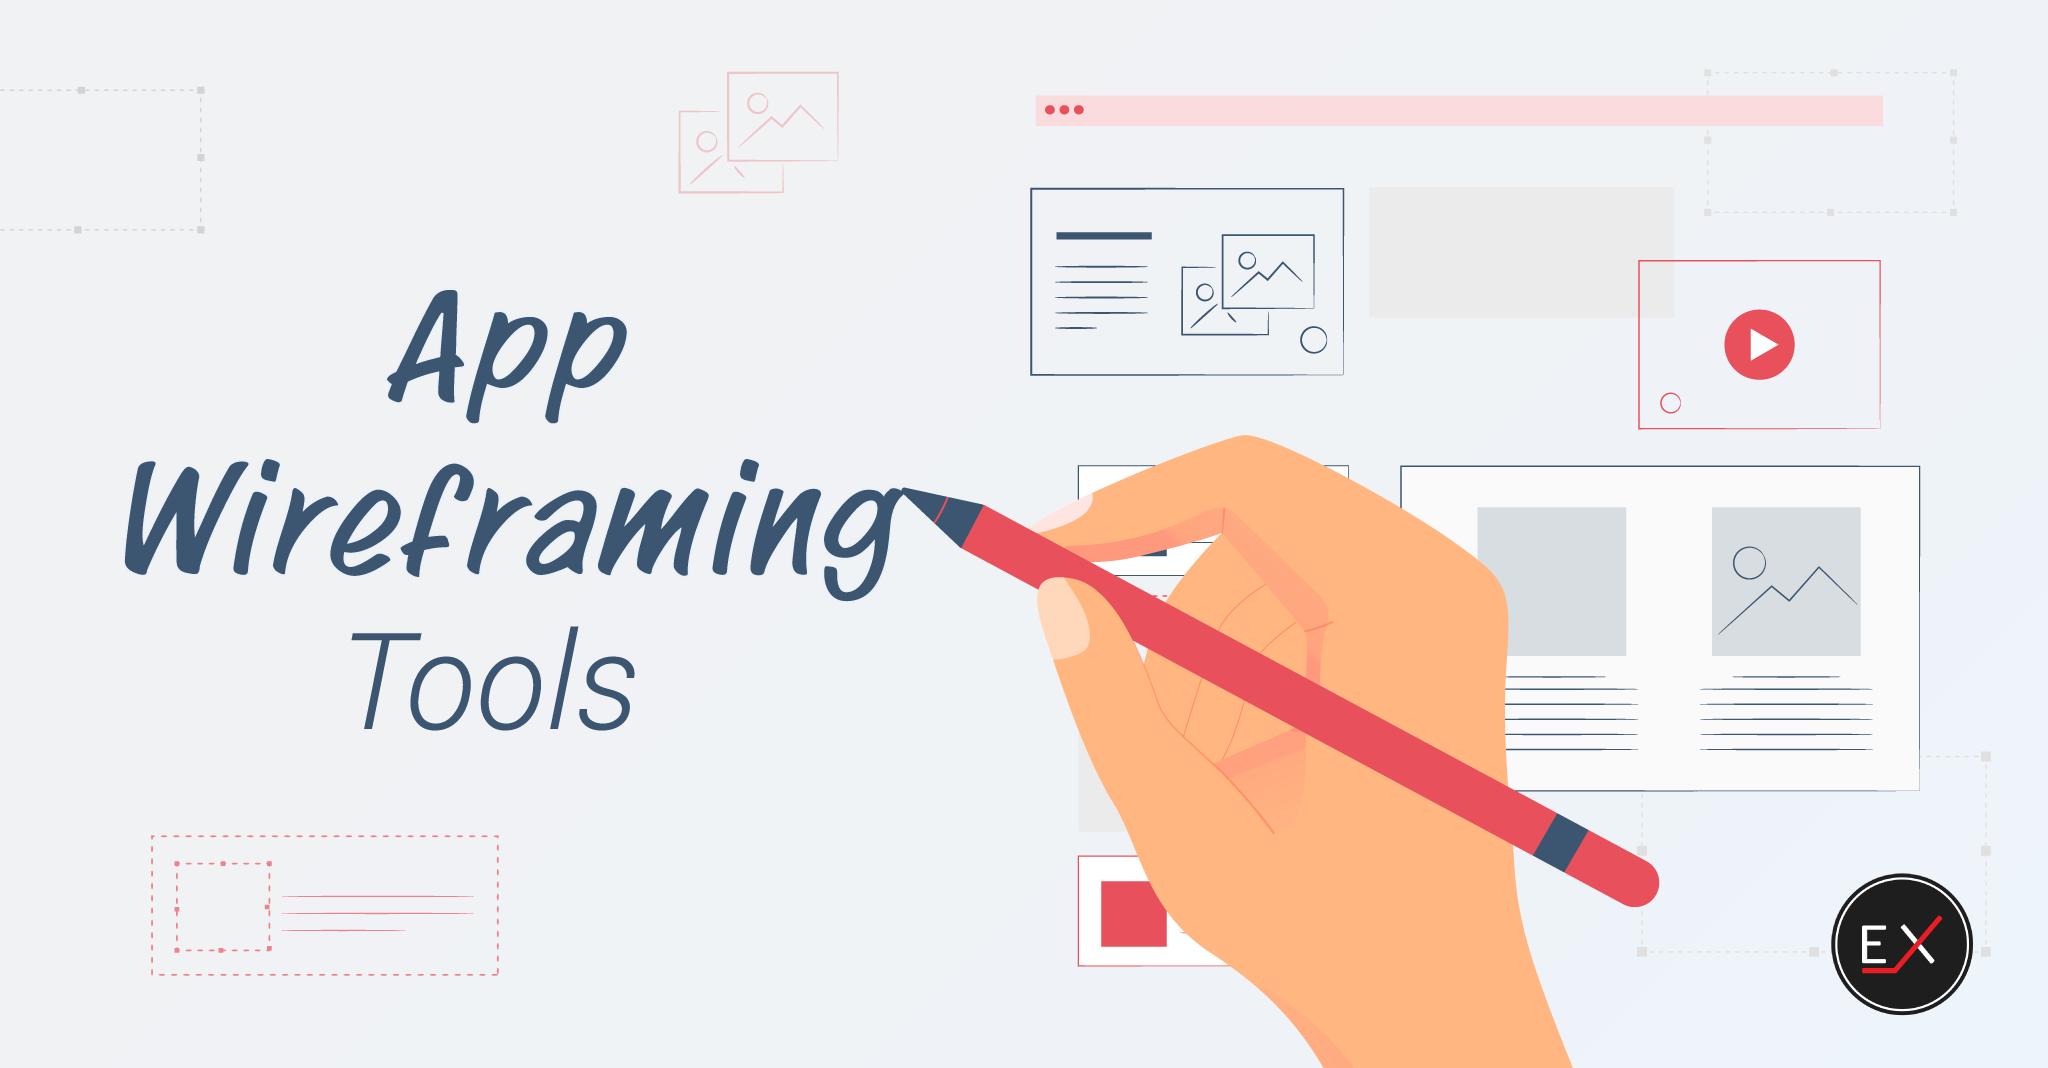 app wireframing tools